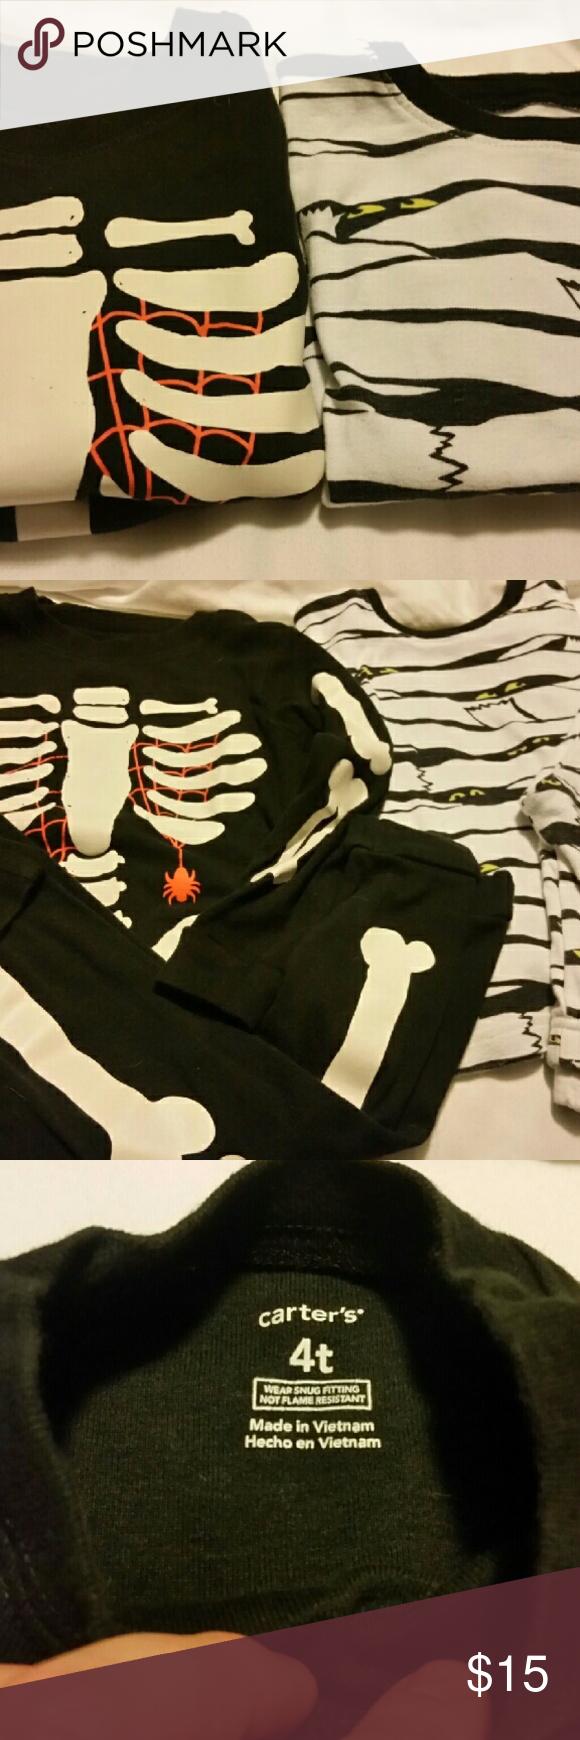 Halloween Pj's 4T Bones on Skeleton & Eyes on mummy glow in the dark!!! Light wear my son outgrew 4T fairly quickly! EUC Carter's Pajamas Pajama Sets